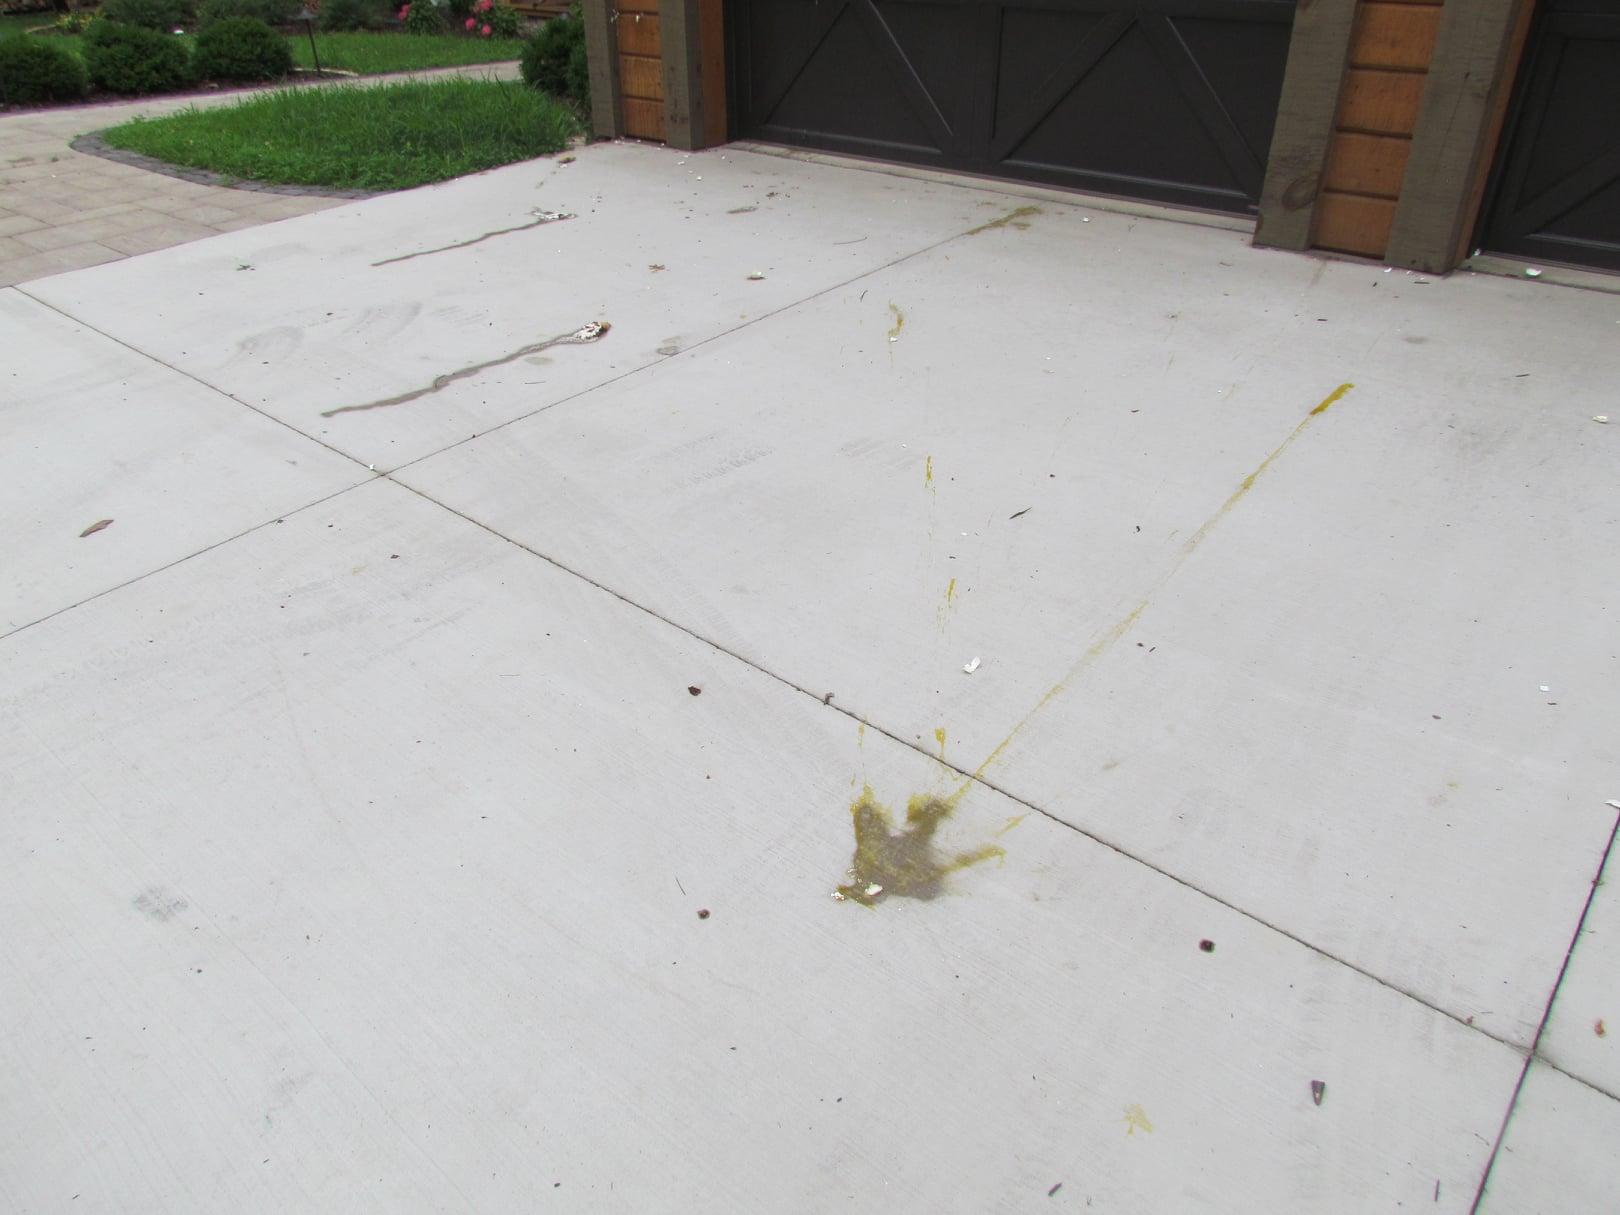 Eggs, toilet paper & ice cream: Houses vandalized in Menominee Co., Sheriff investigating